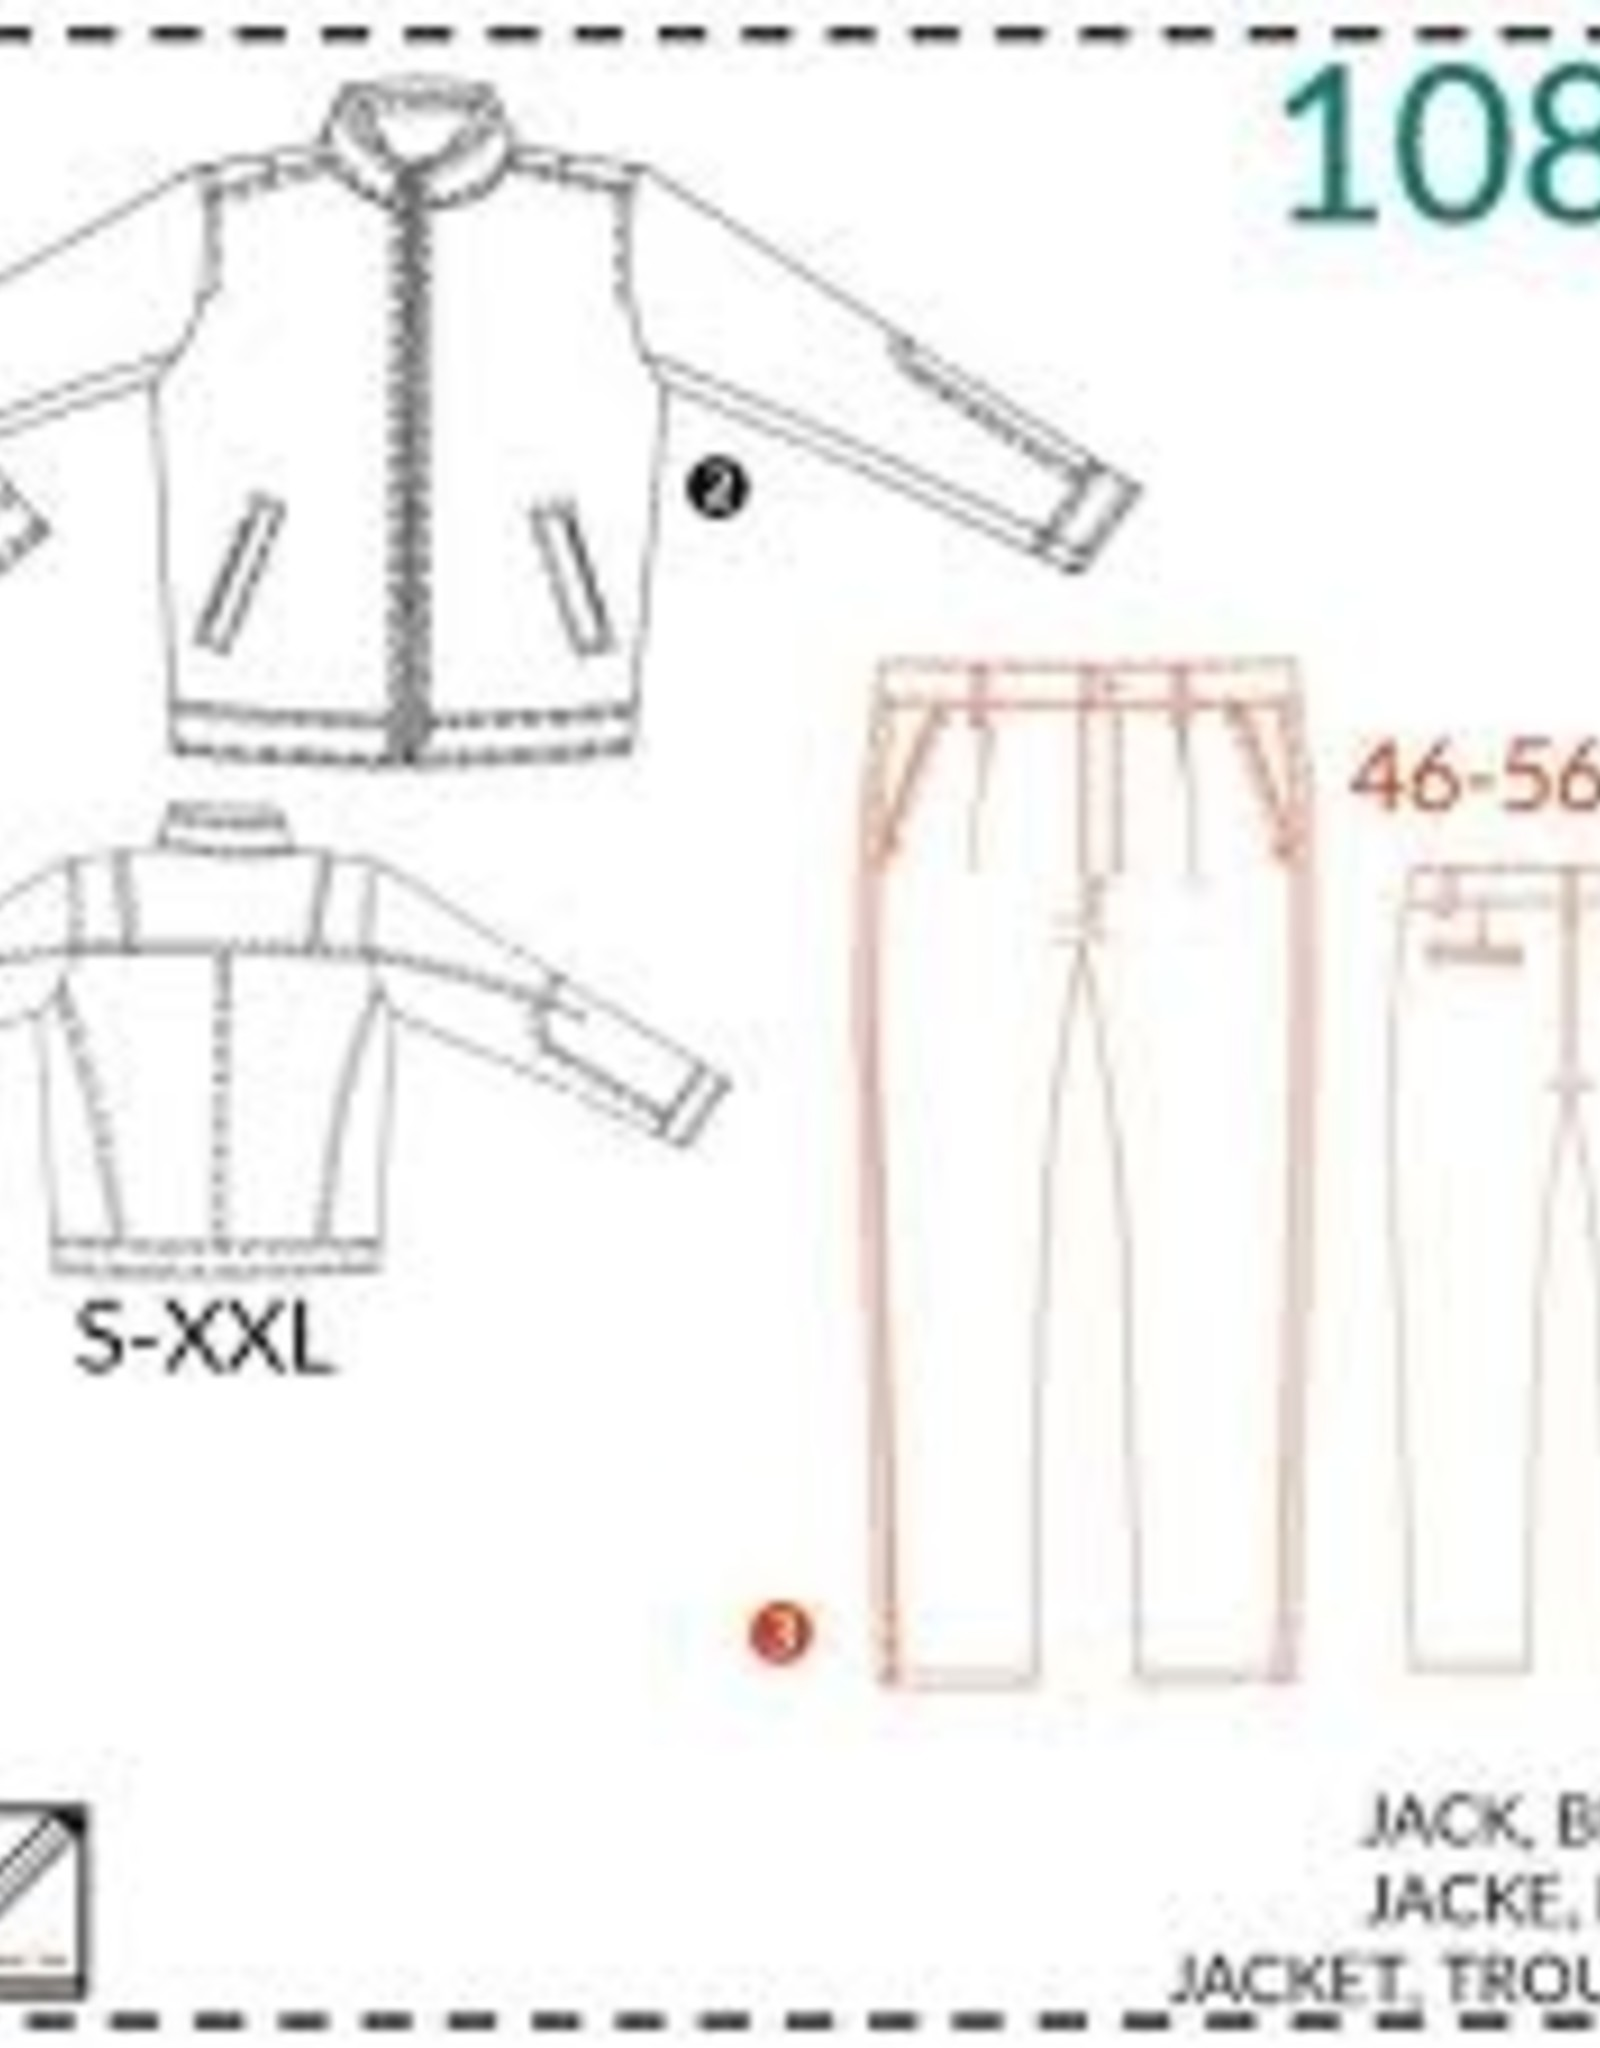 It's A fits Jack, broek 1081 - It's A fits